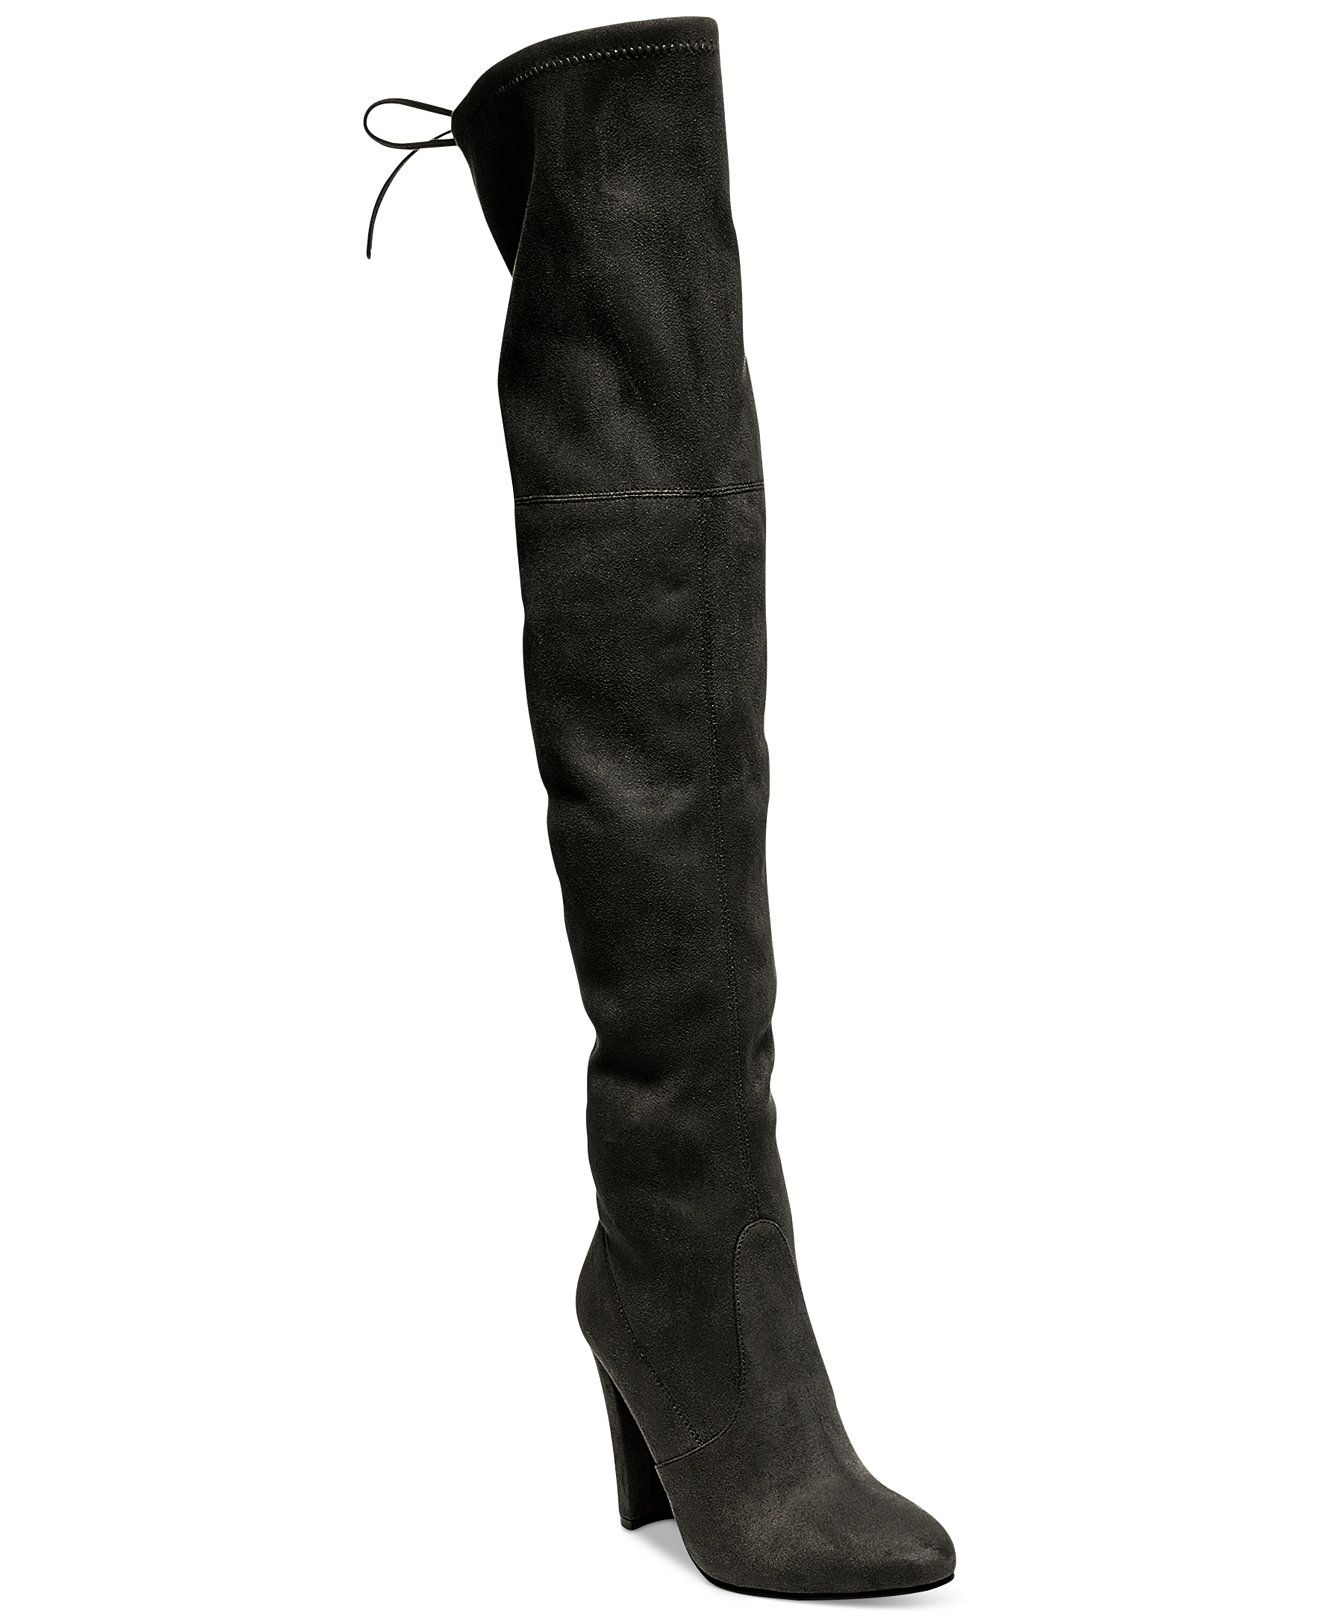 8e51951c51c Steve Madden Women s Gorgeous Over-The-Knee Boots